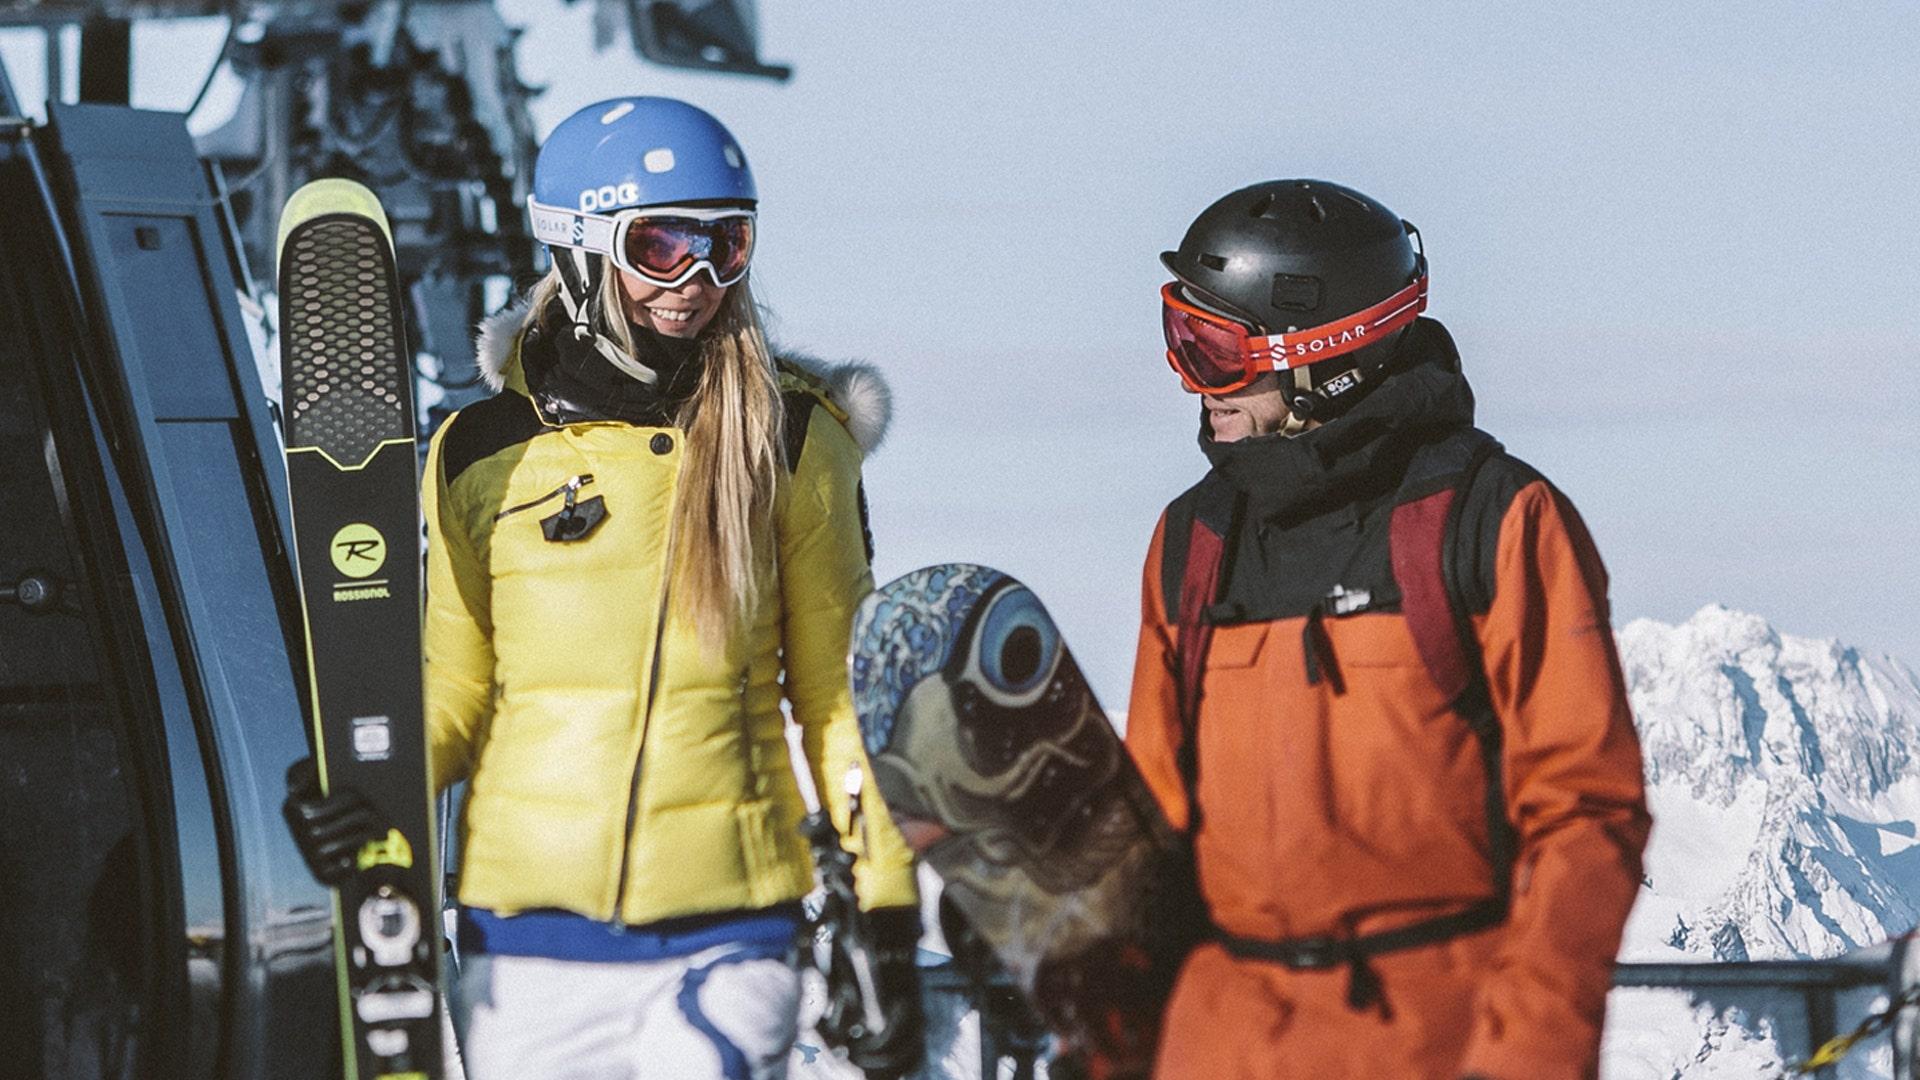 goggles, ski, snowboard, winter, women, men, new in